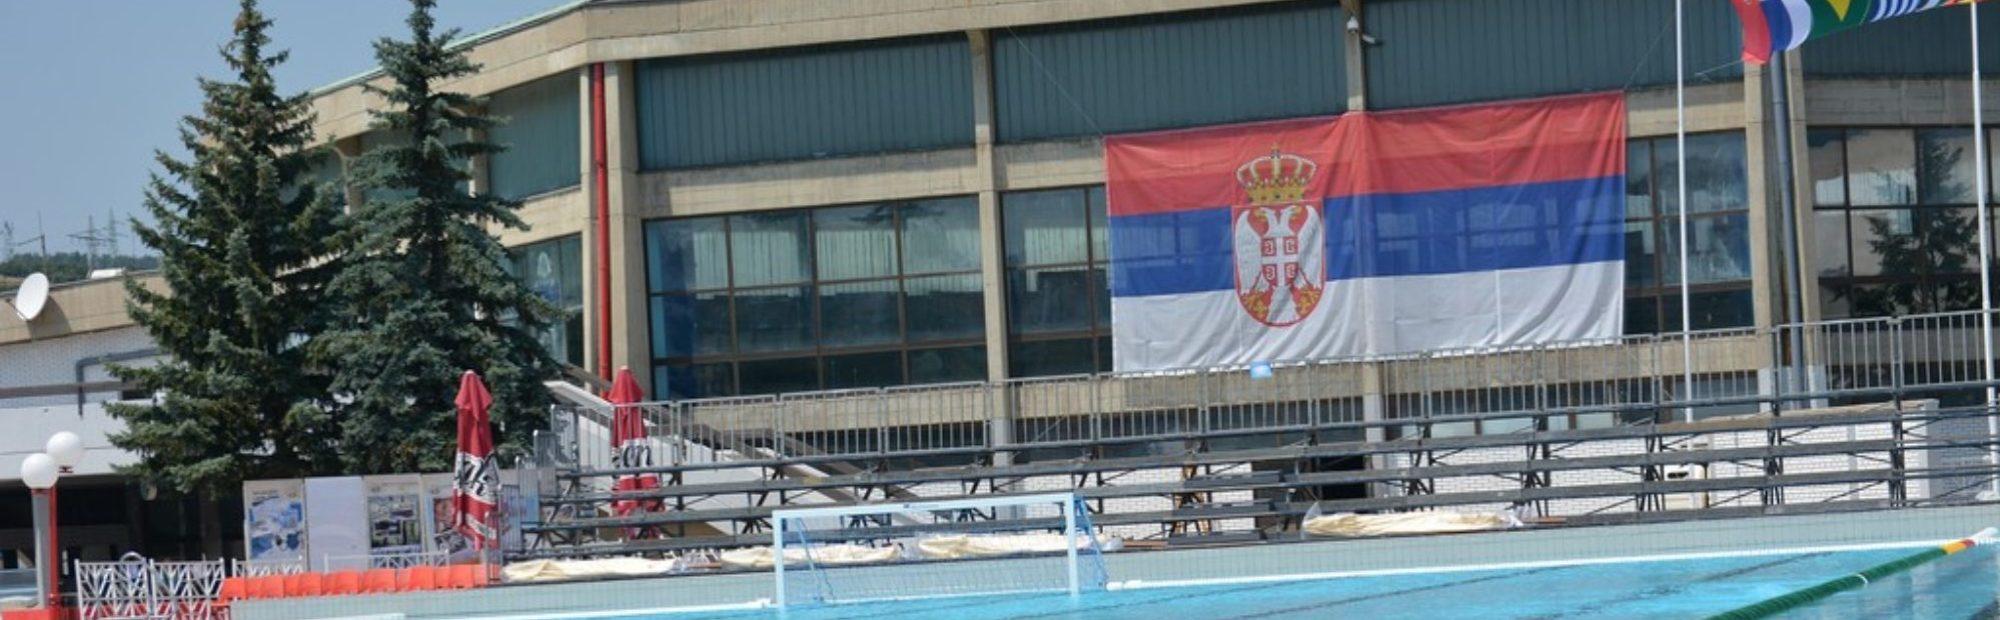 Sportski centar Bor